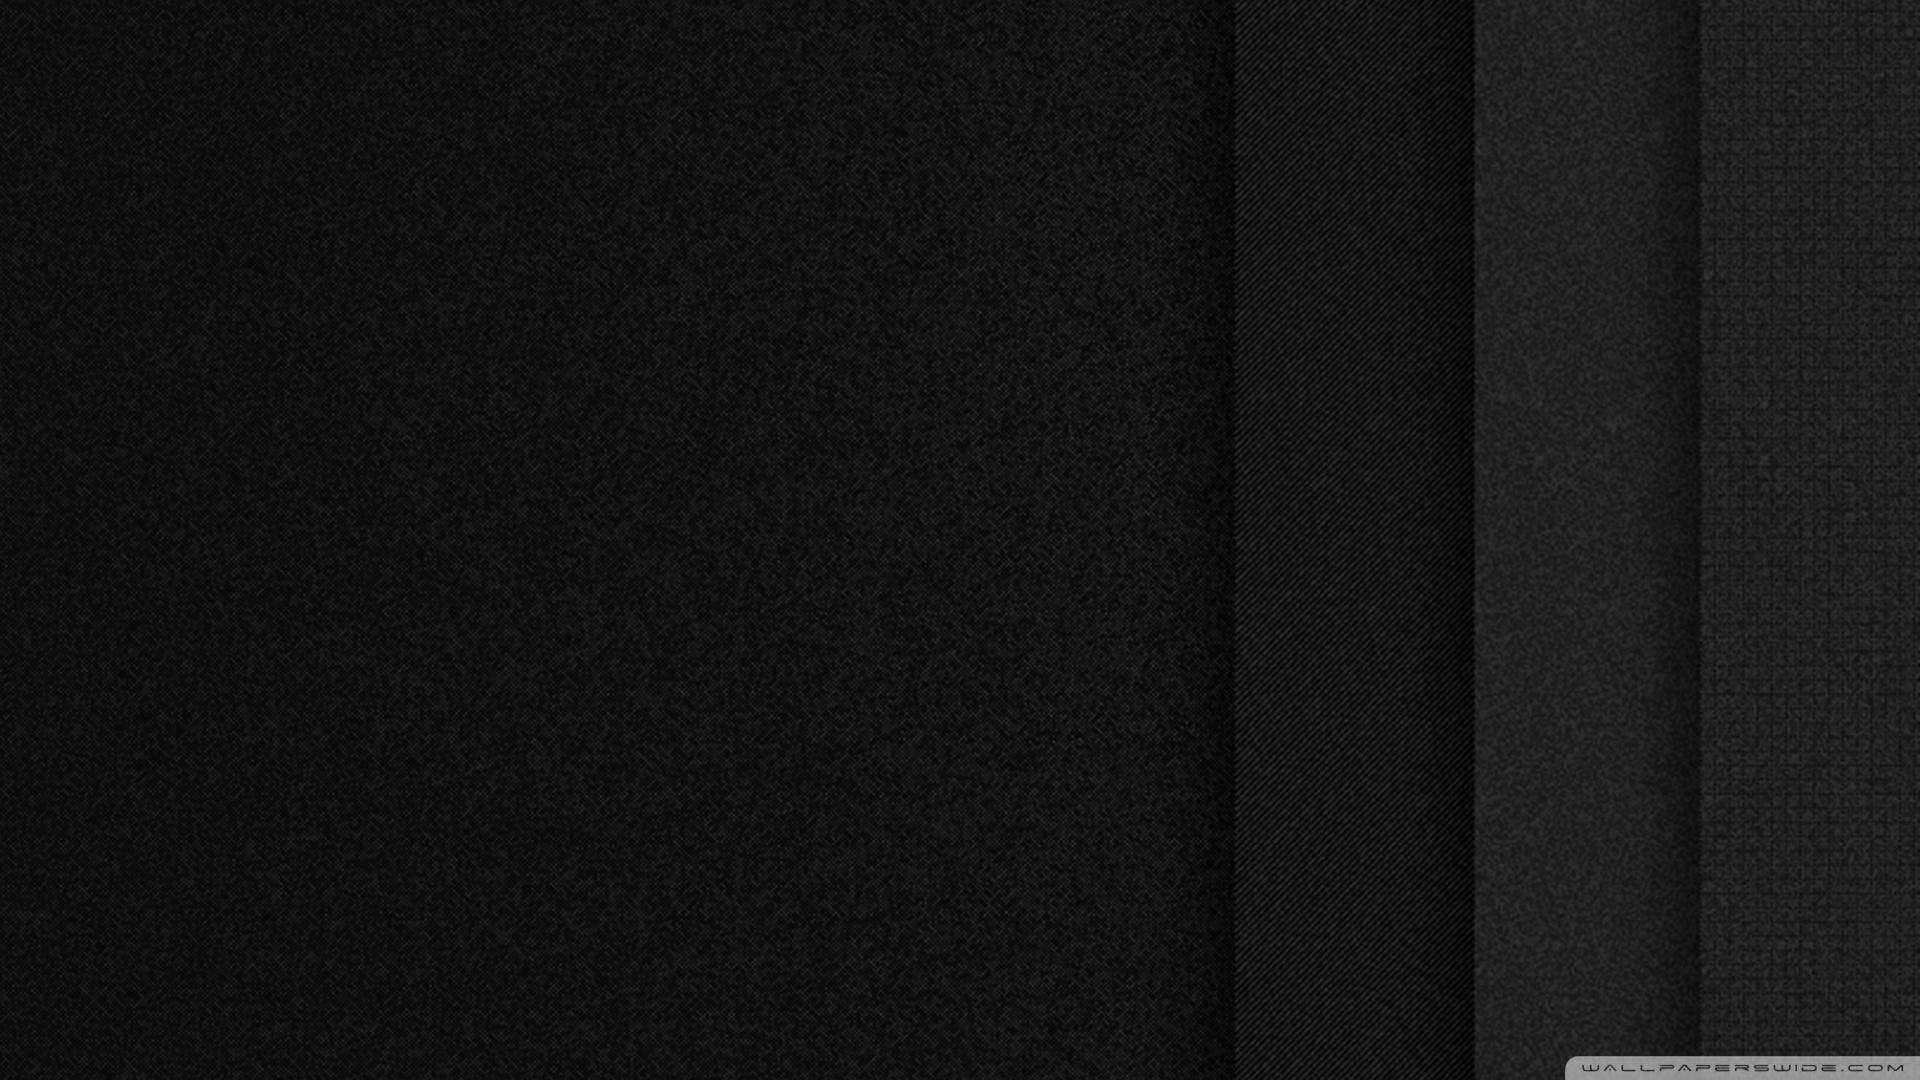 Black Fabric Texture Wallpaper 1920x1080 Black Fabric Texture 1920x1080